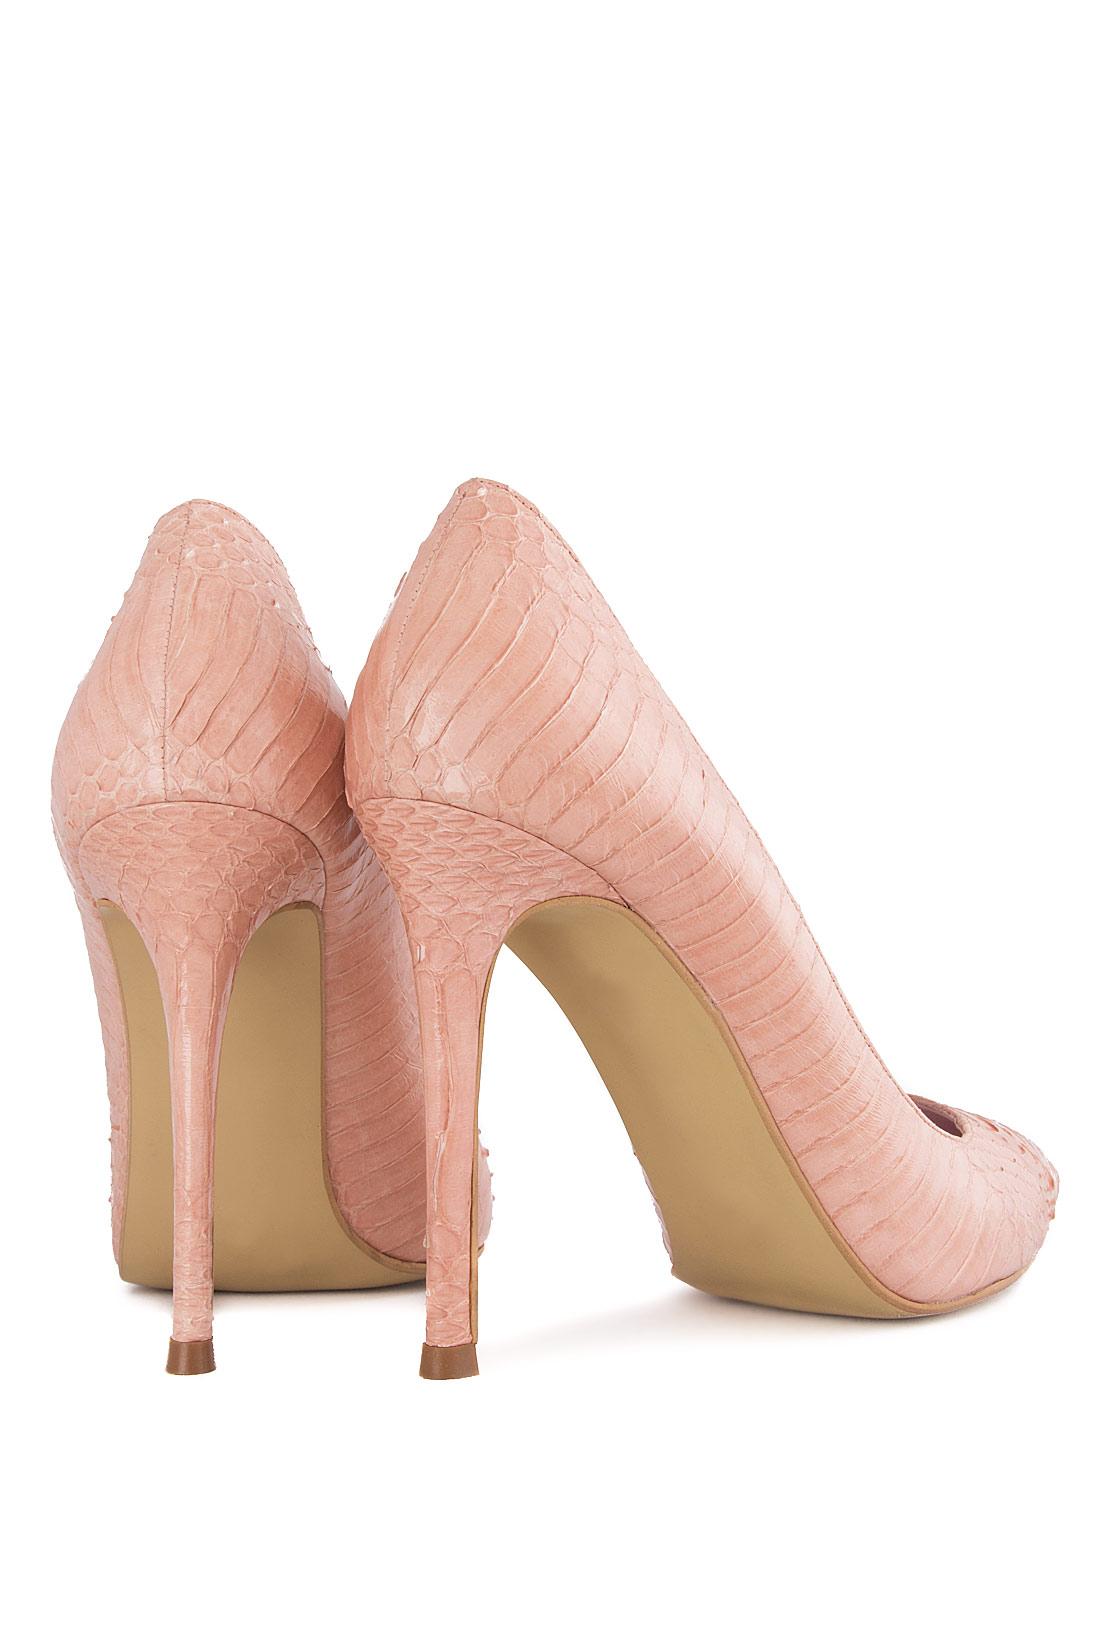 Atelier Faiblesse   Pantofi din piele naturala de piton